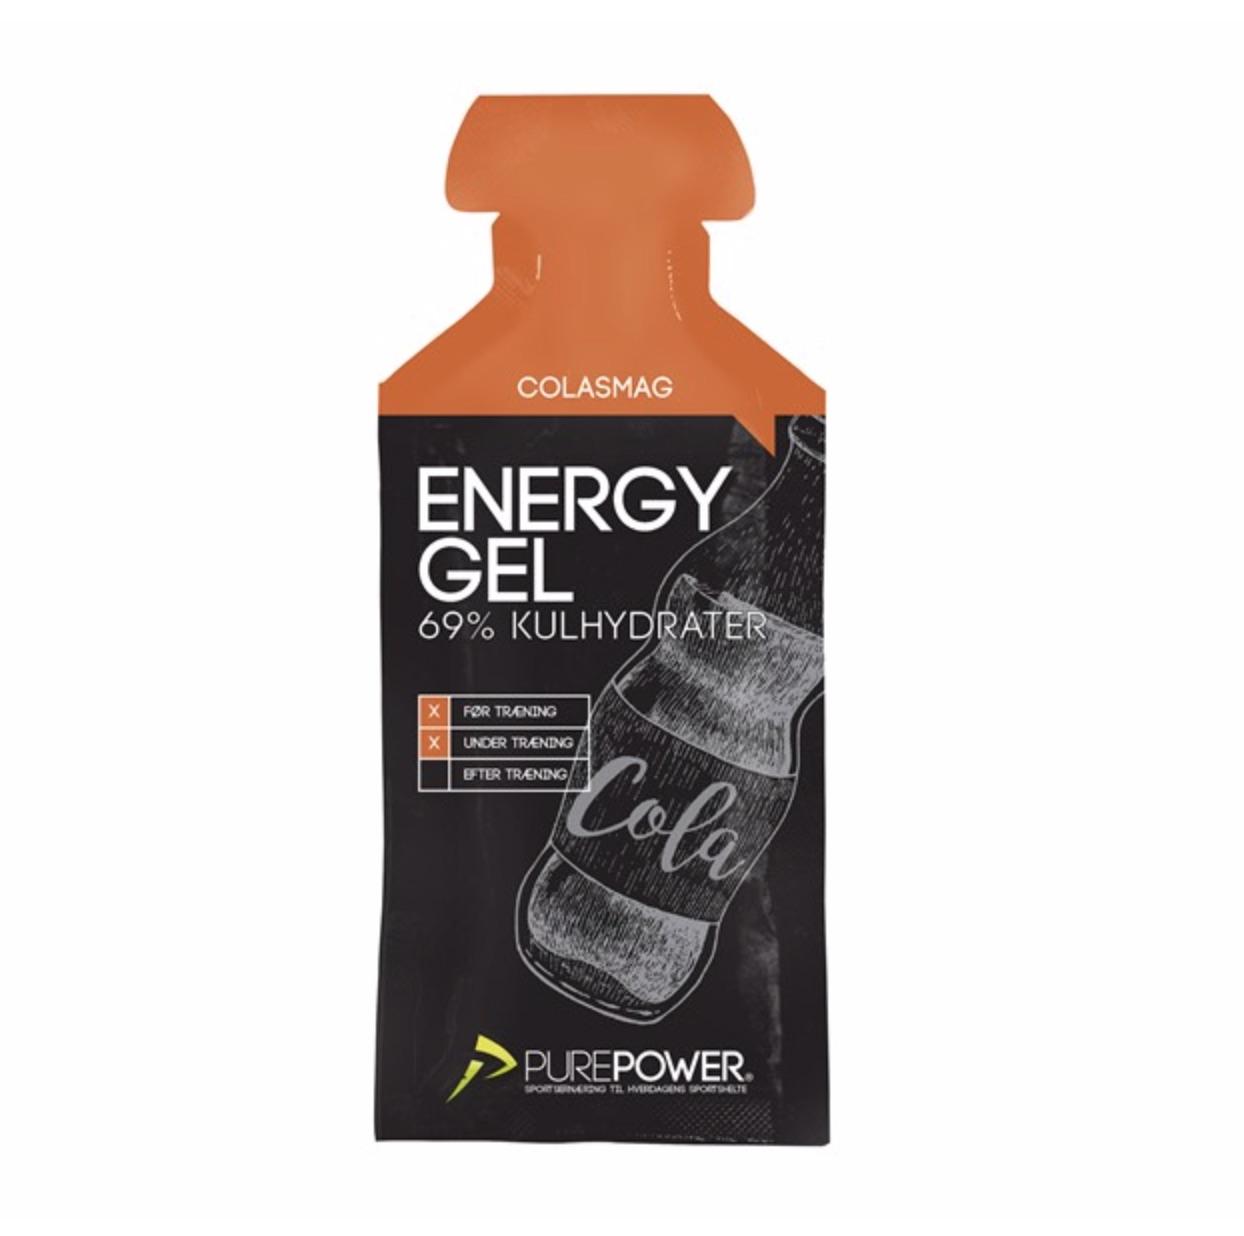 PurePower Energy Gel - 1x40 gram - Cola - 6951760   Energigels